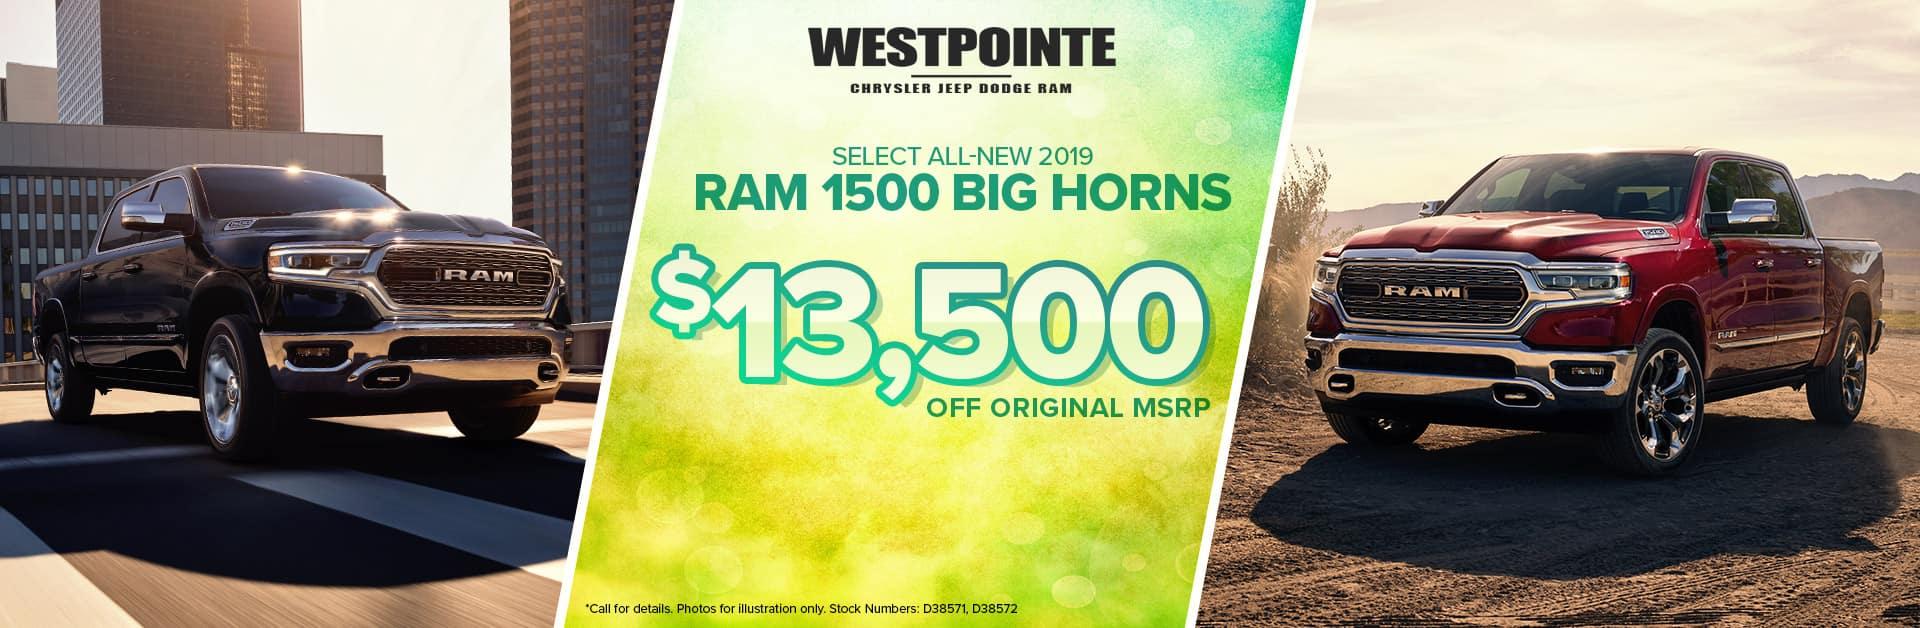 2019 Ram 1500 Big Horn - Westpointe Chrysler Jeep Dodge Ram